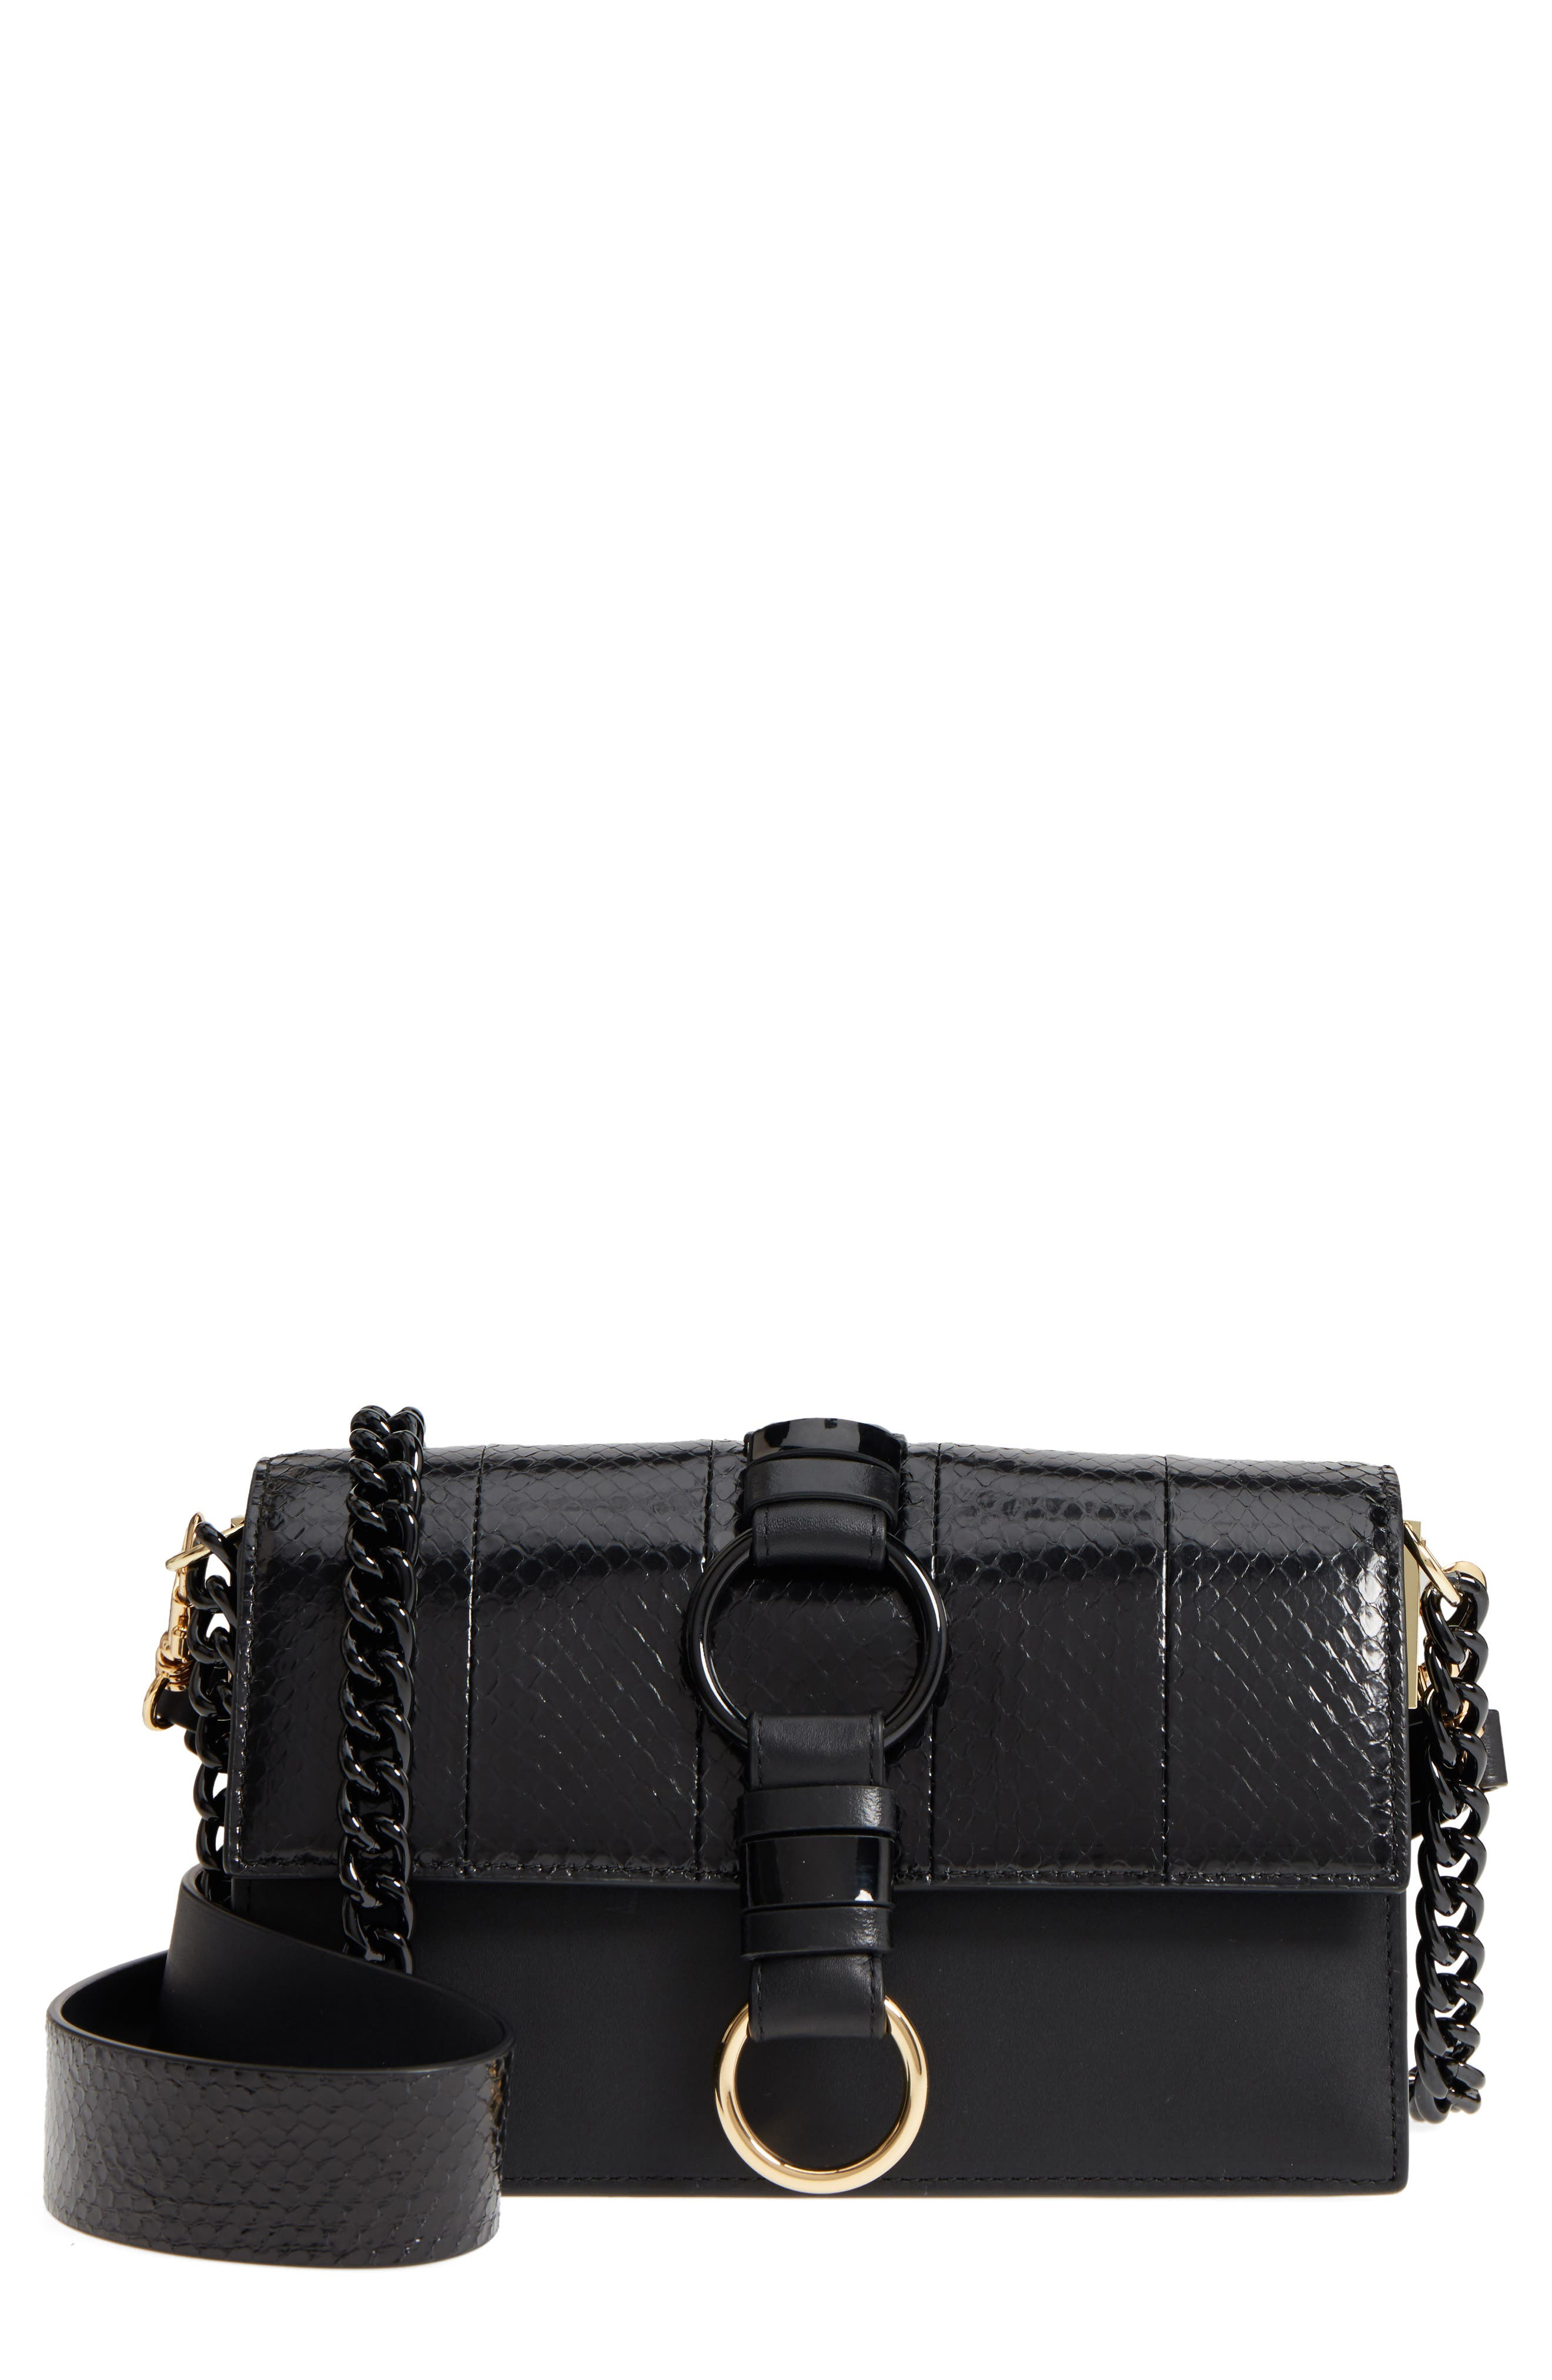 Bonne Journée Leather & Genuine Snakeskin Crossbody Bag,                             Main thumbnail 1, color,